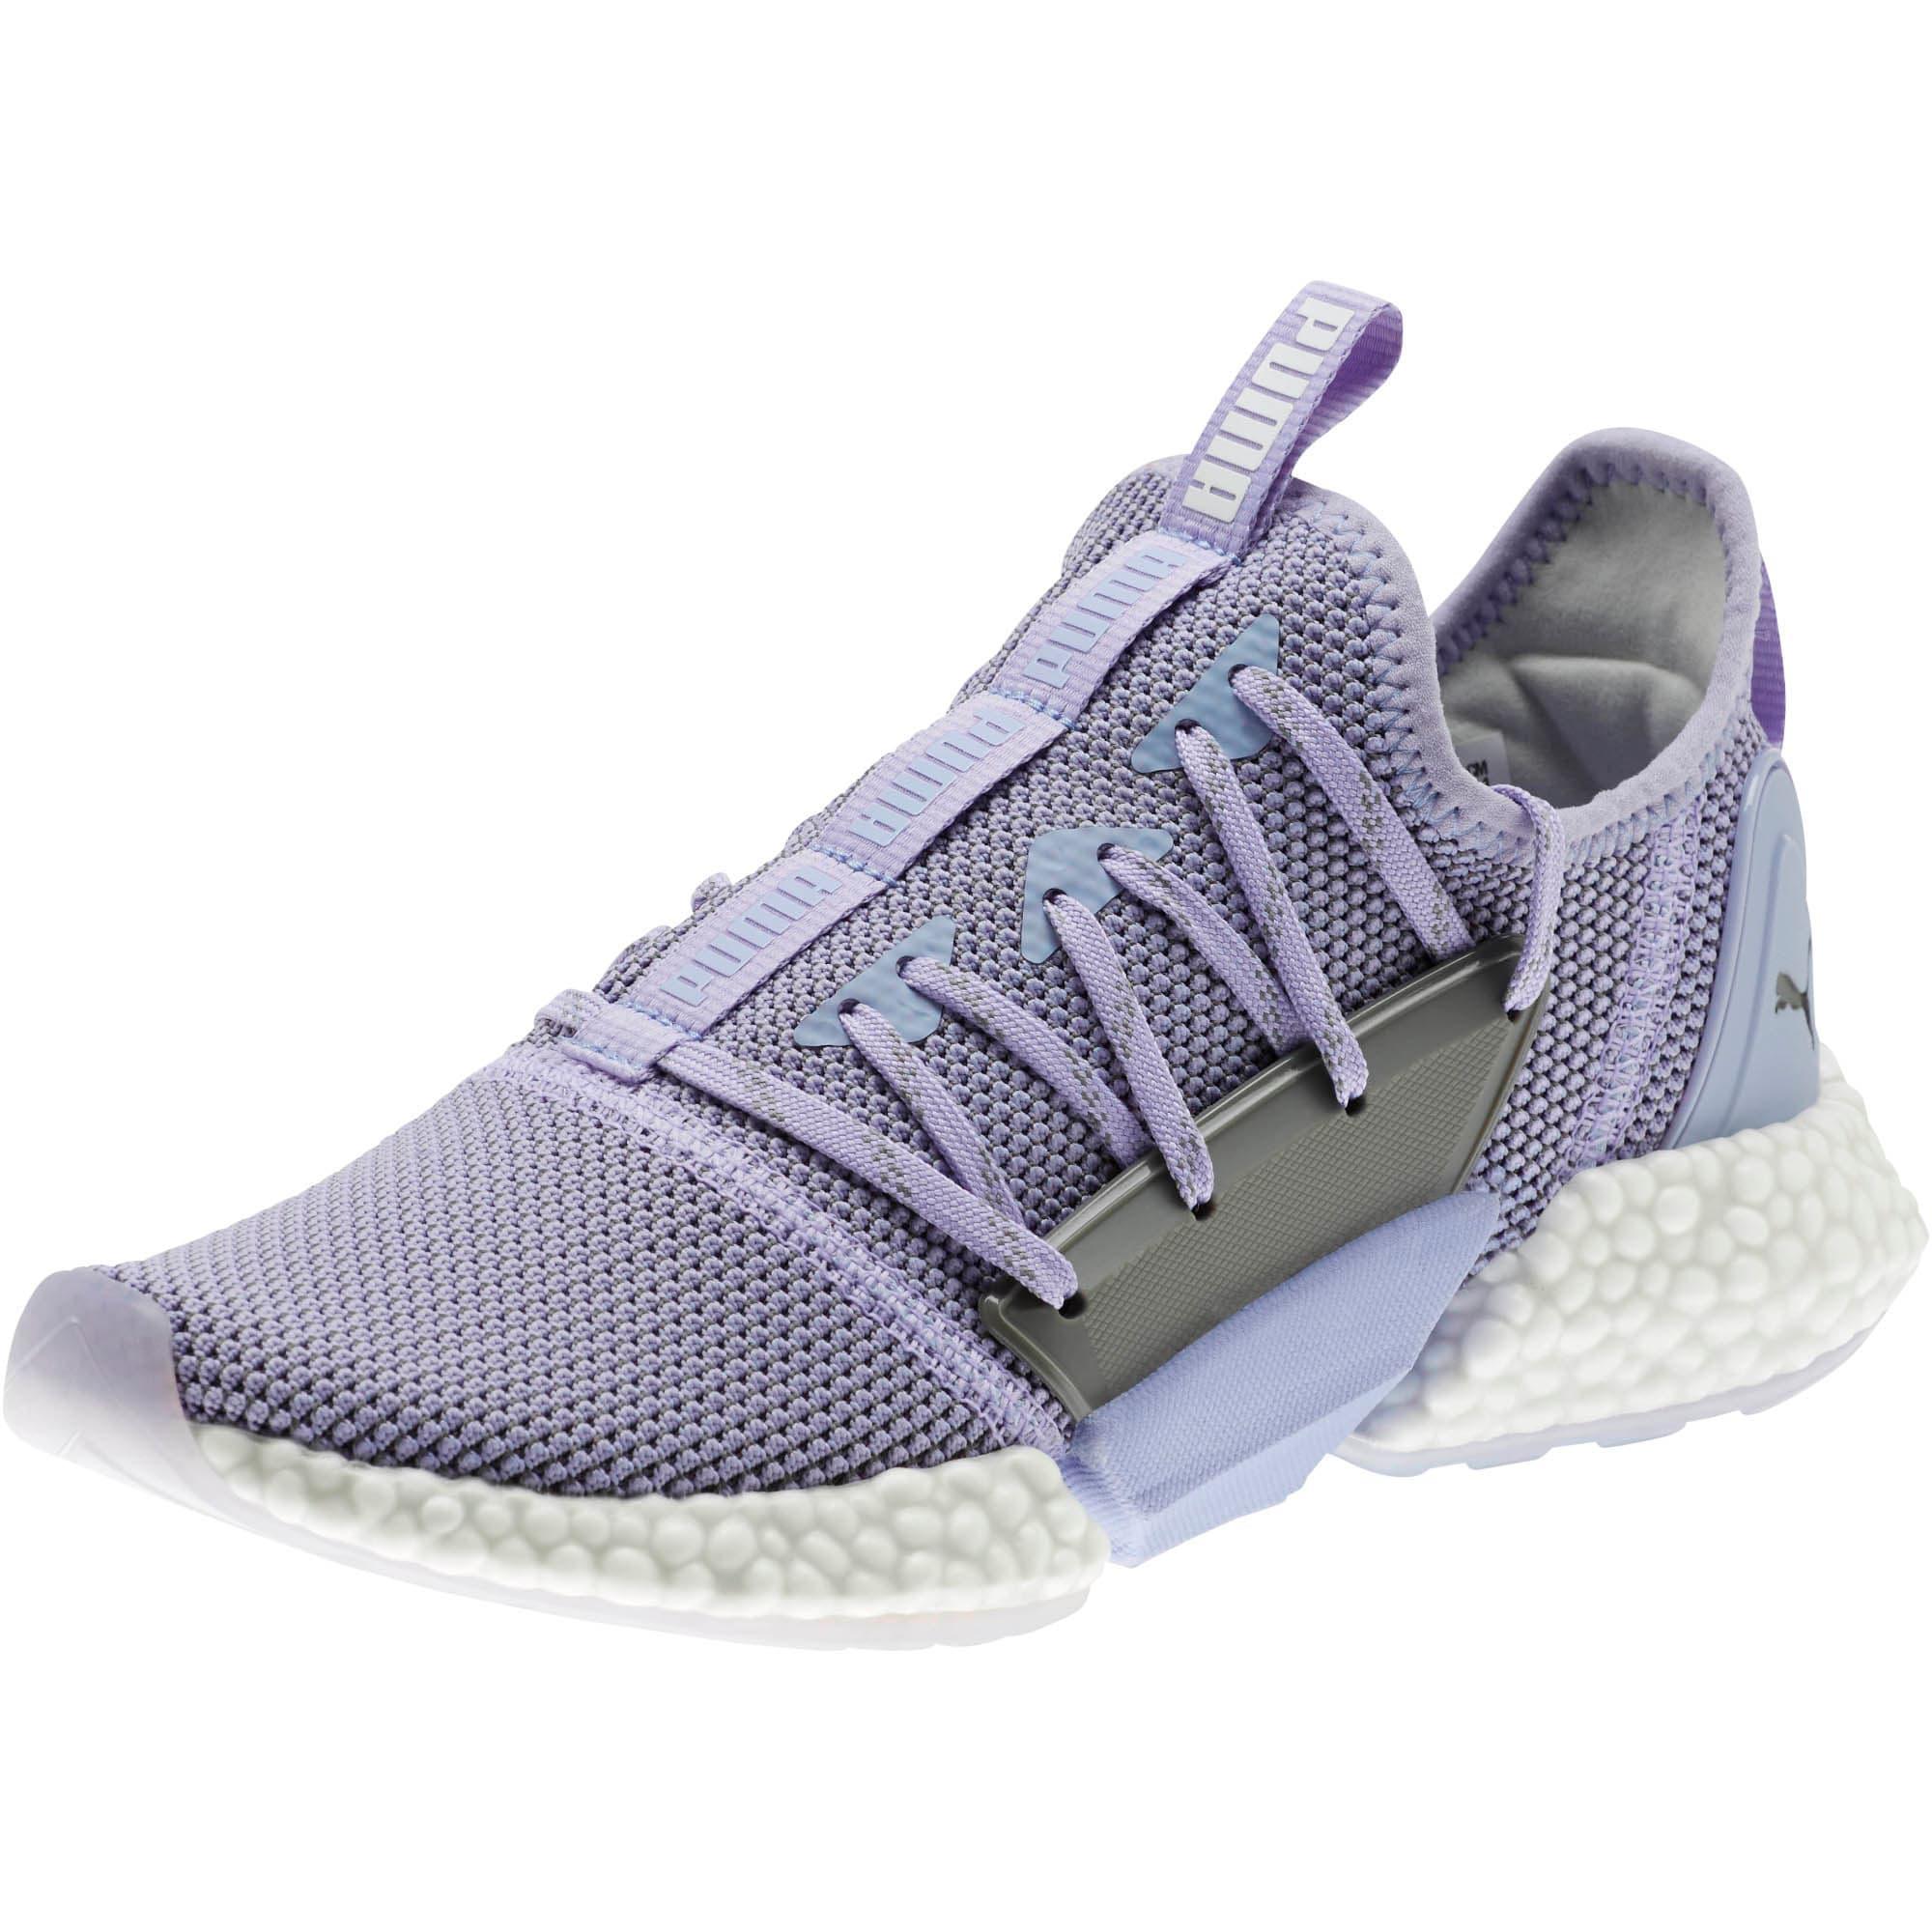 Thumbnail 1 of HYBRID Rocket Runner Women's Running Shoes, Sweet Lavender-Puma White, medium